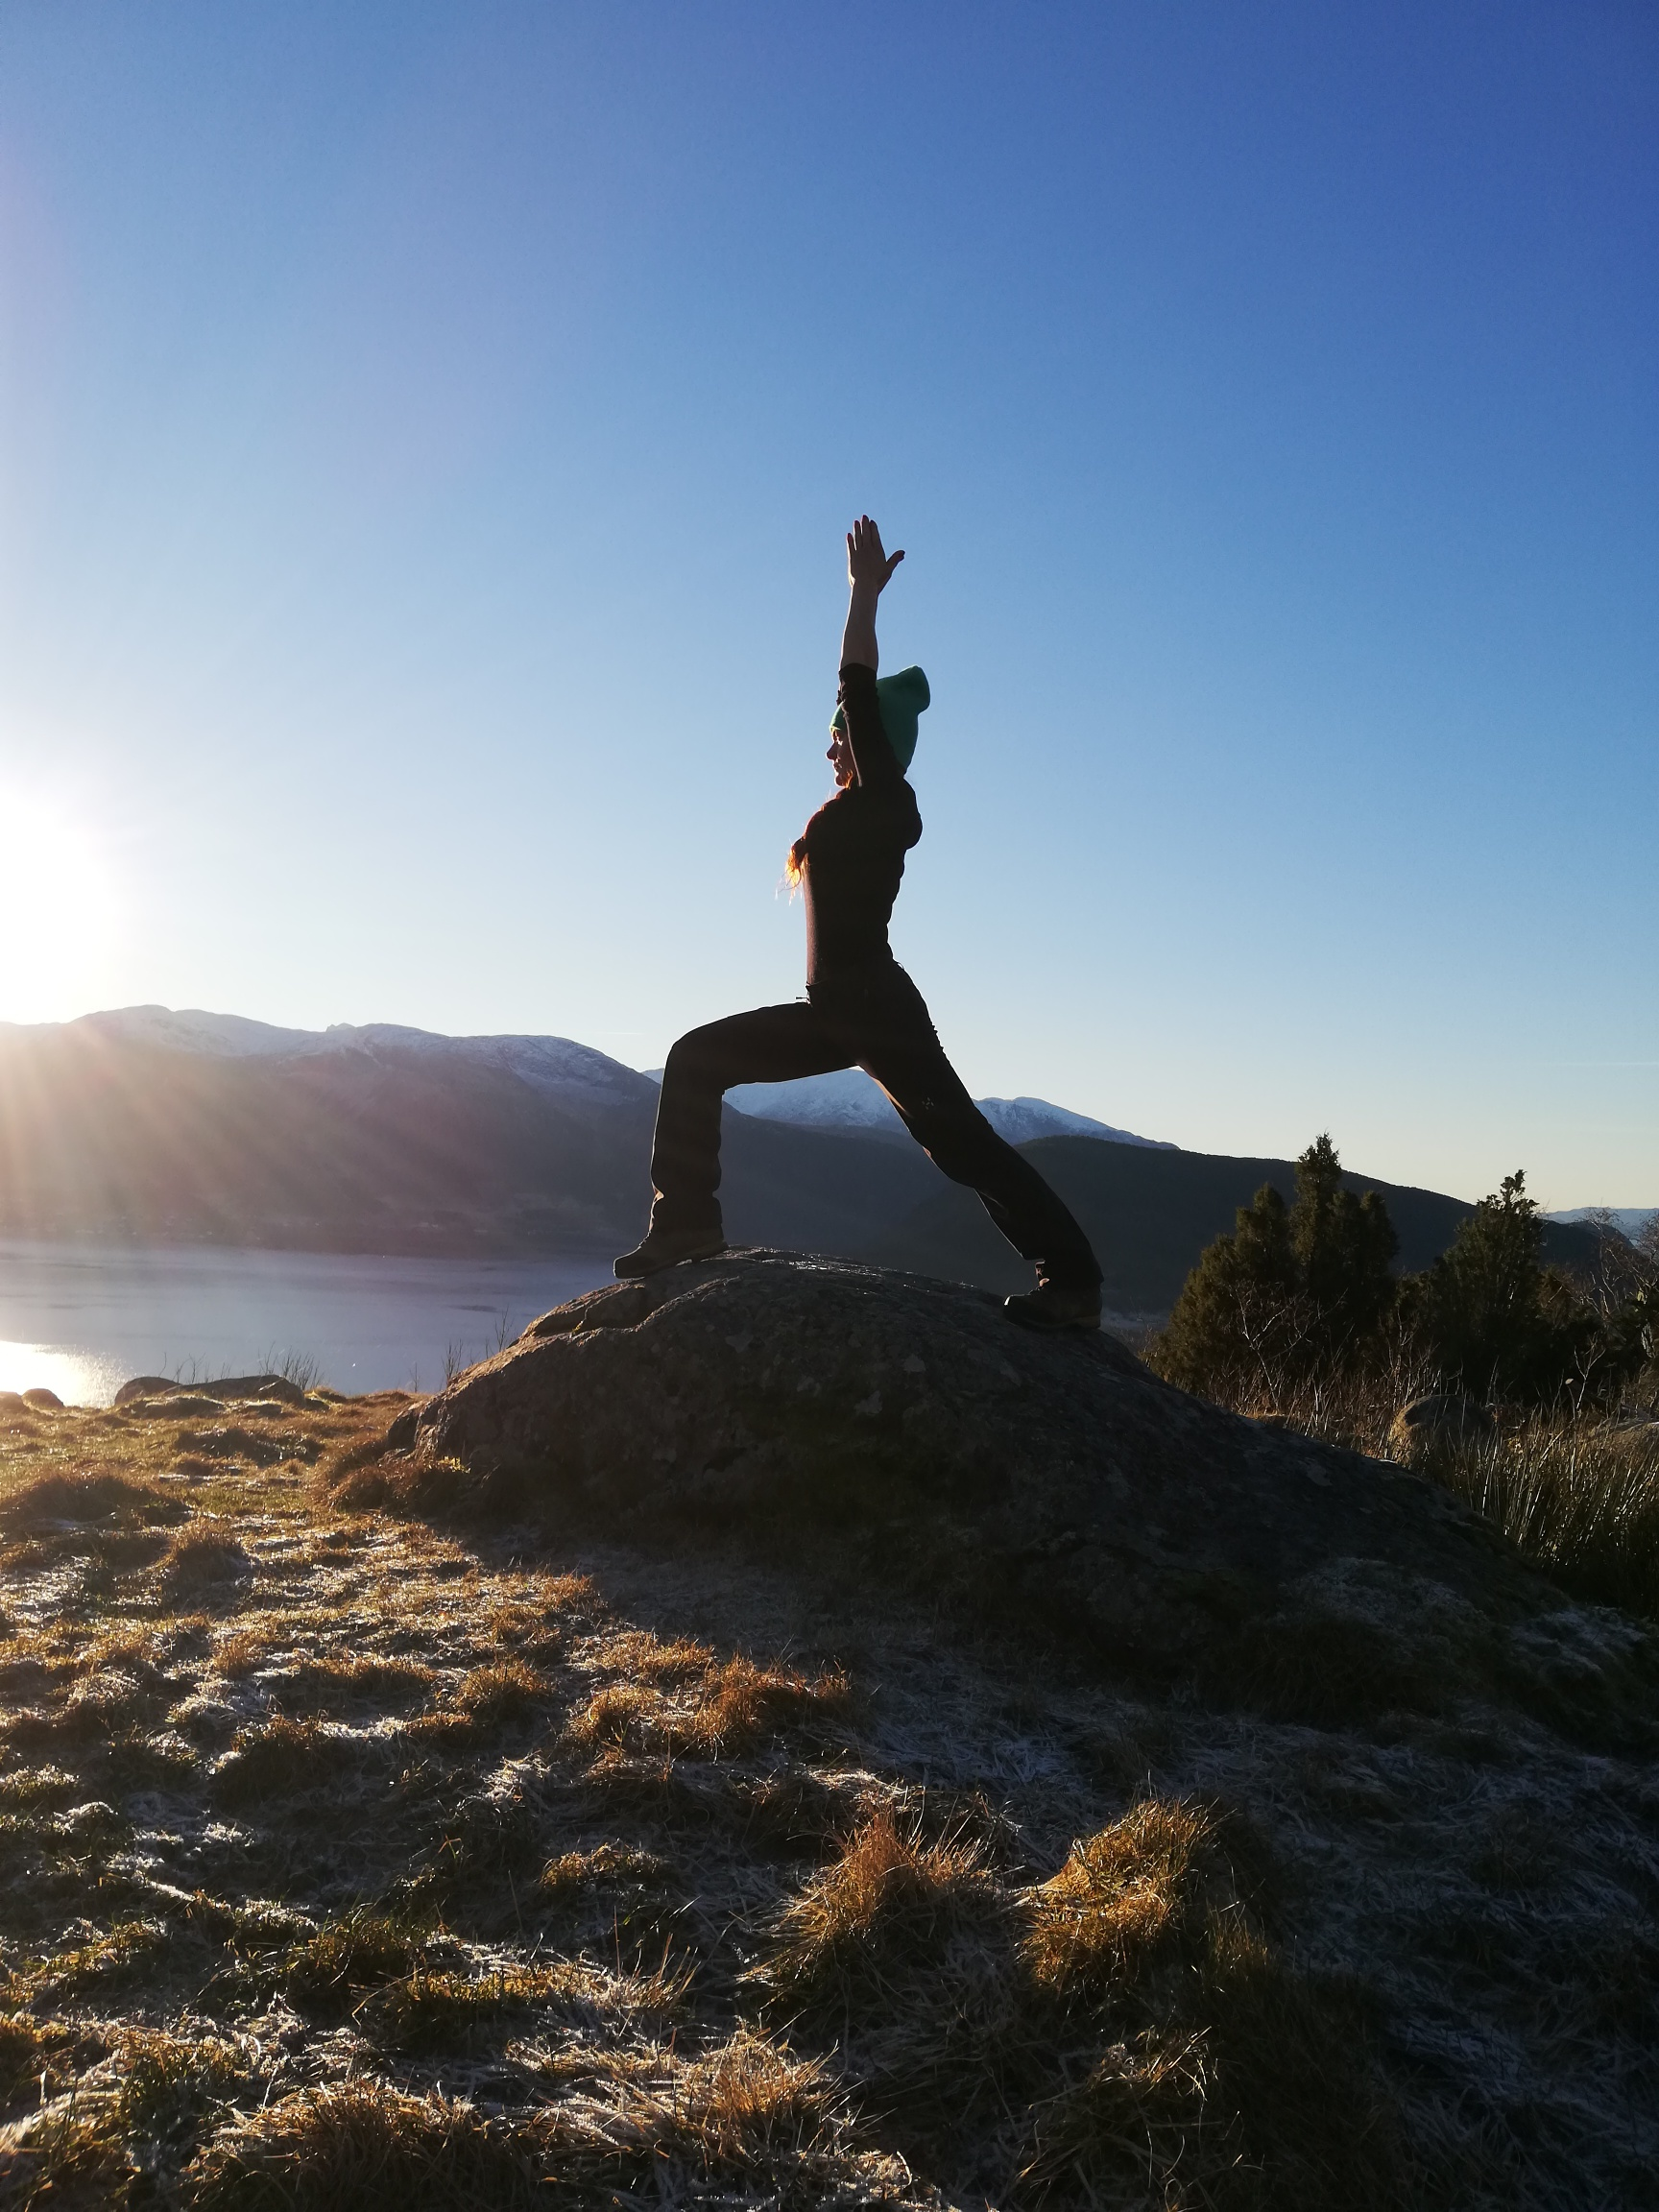 signe yoga, signe rosendal. stress, mindre stress, yoga mot stress, yoga gir ro, ro ned i julen, balanse, yoag i rosendal, resignert yoga, yoga every damn day, daglig yoga, daily yoga